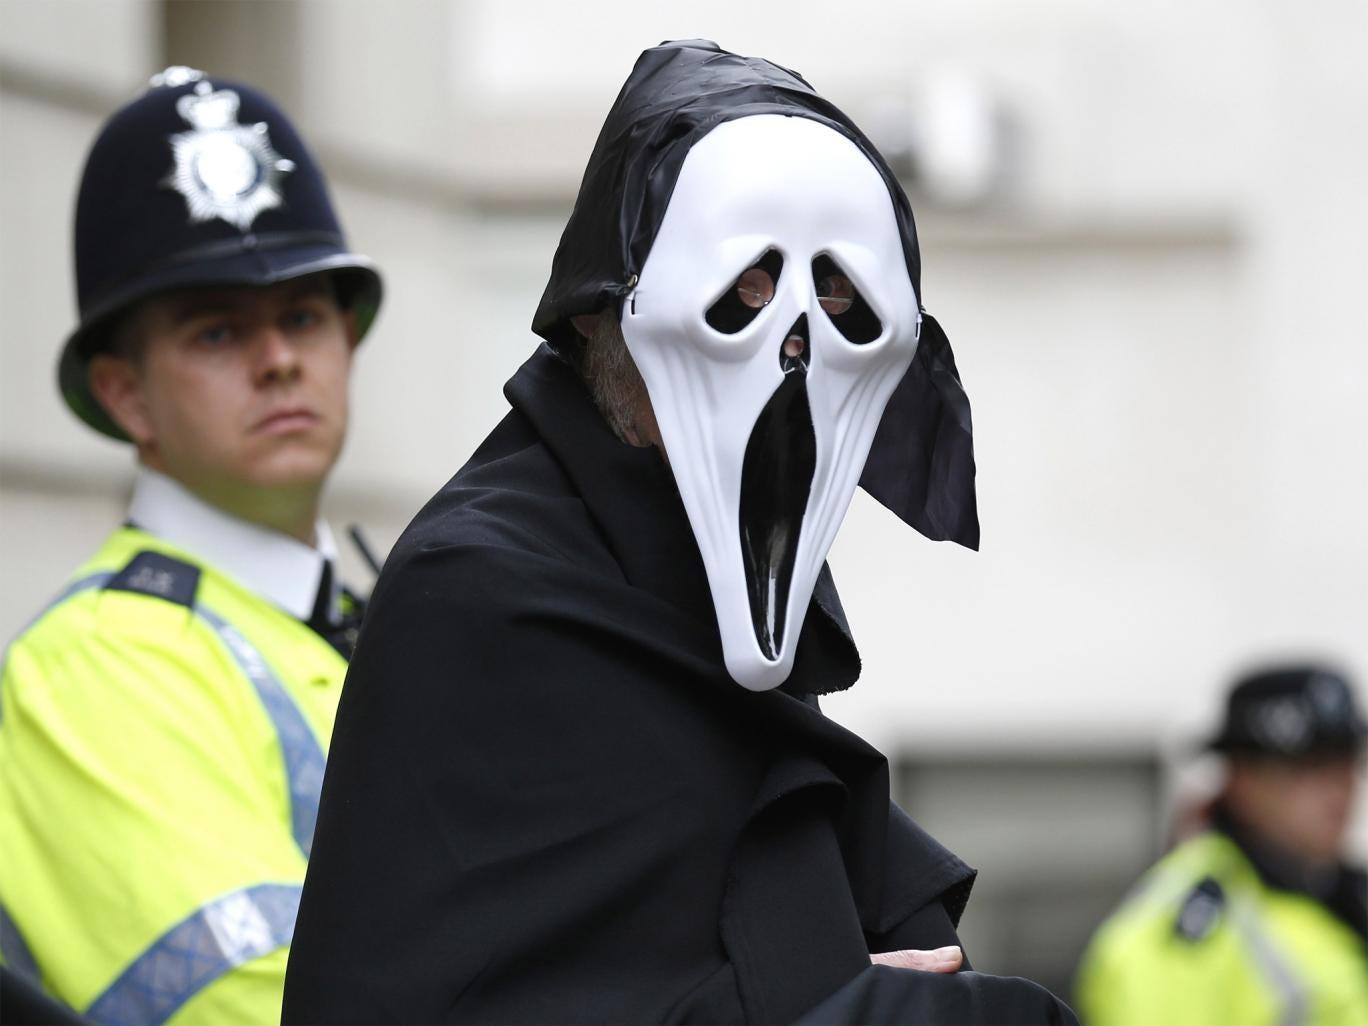 Anti-capitalist protester in Enniskillen, Northern Ireland, ahead of next week's G8 Summit